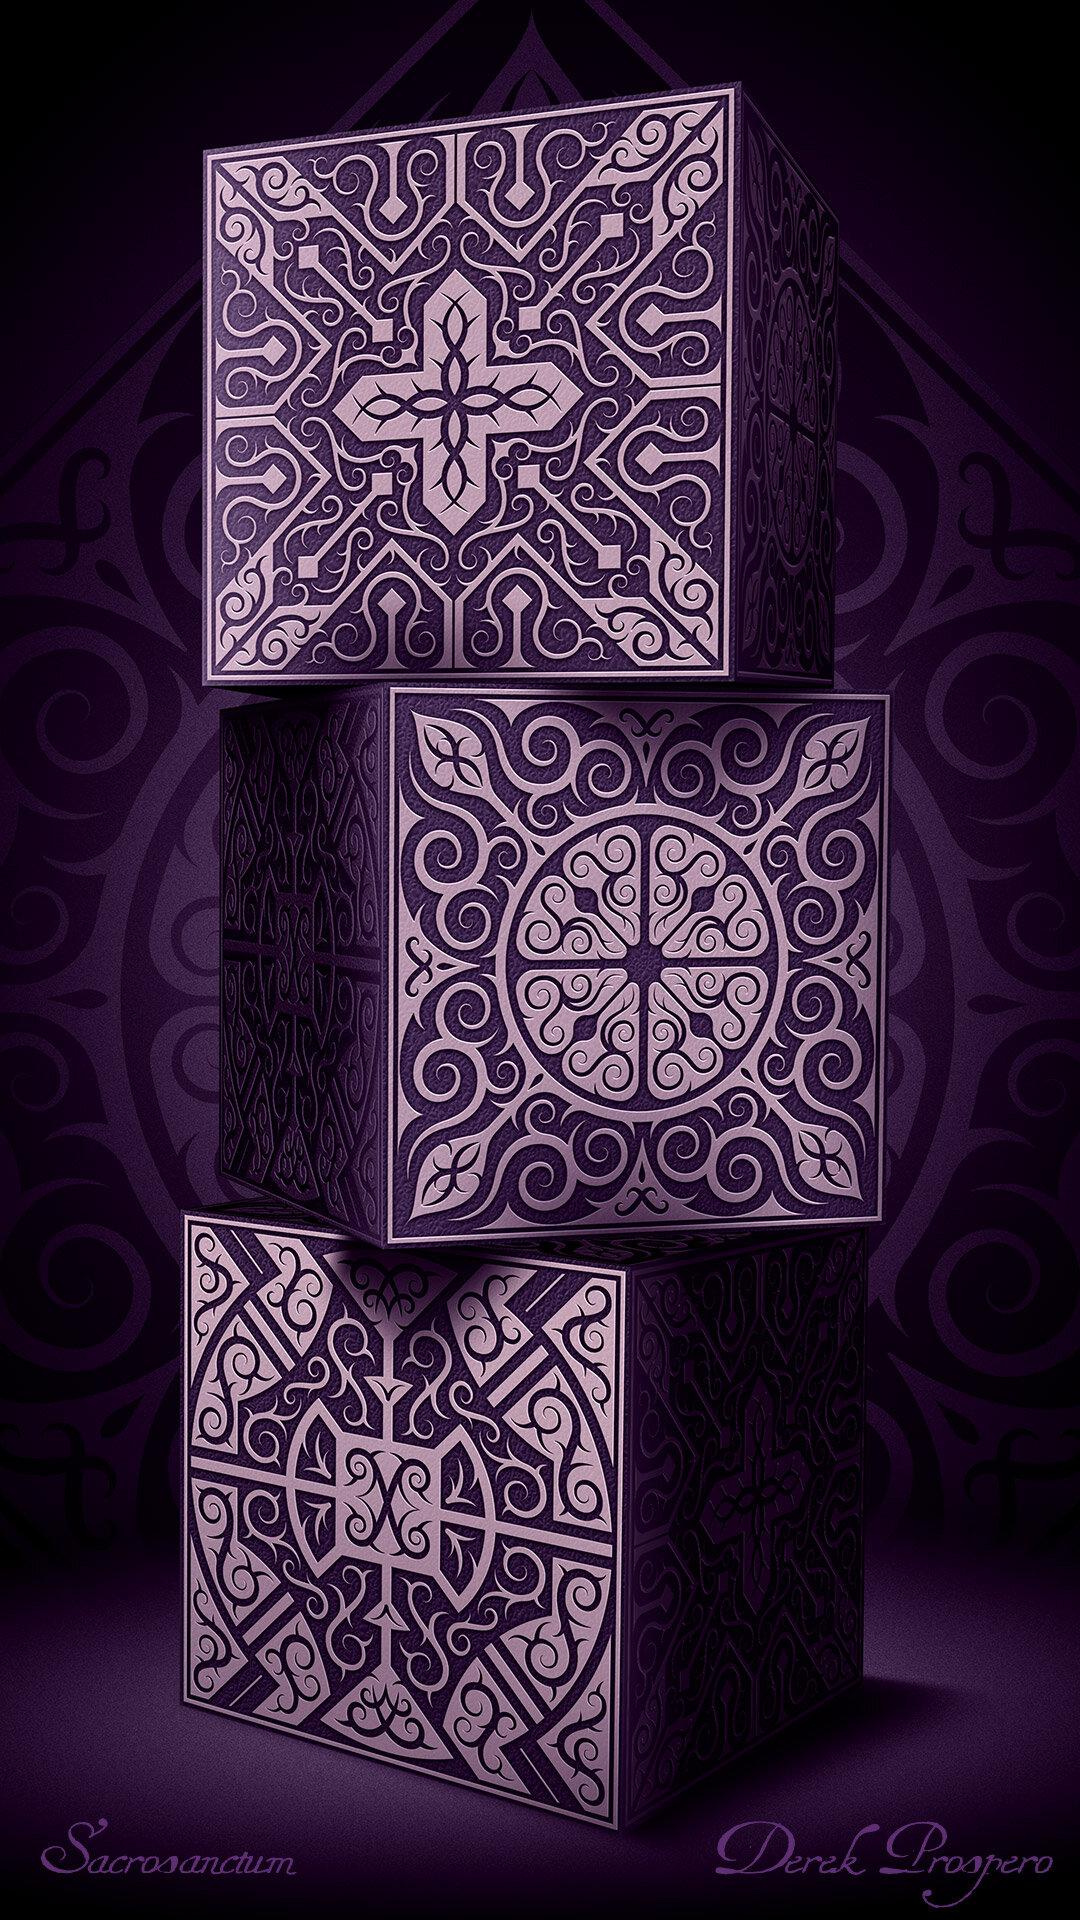 cube-sacro-2.jpg